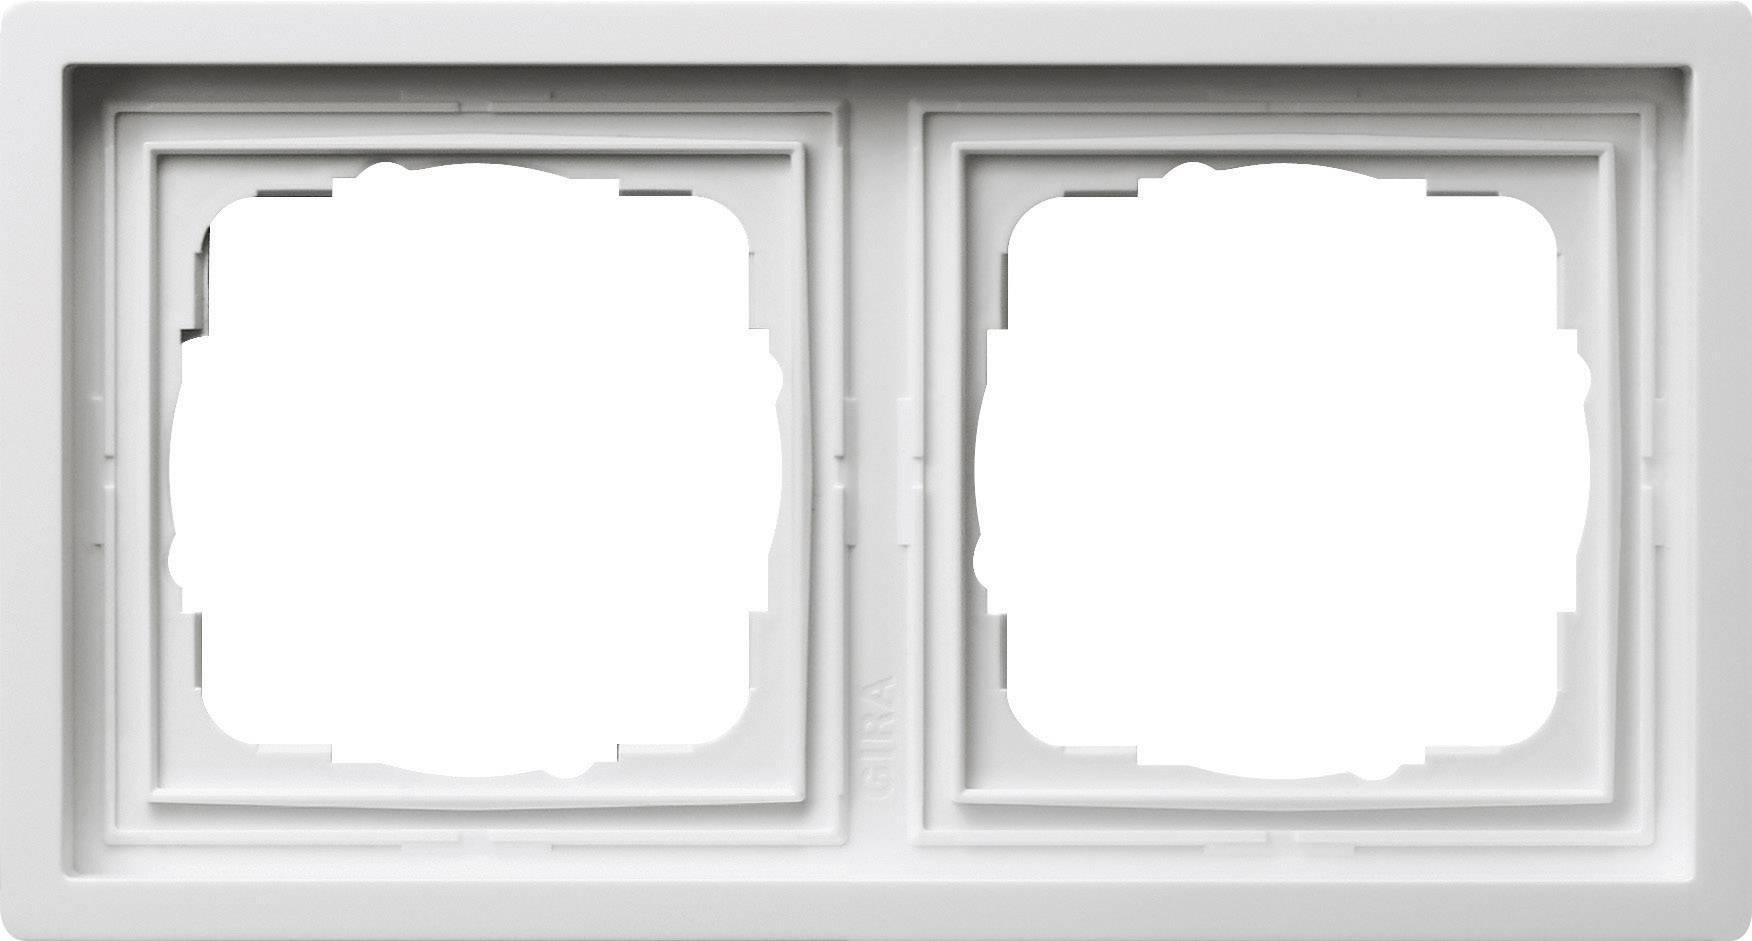 Rámeček plochého spínače 2dílný Gira, standard 55, čistá bílá (0212112)